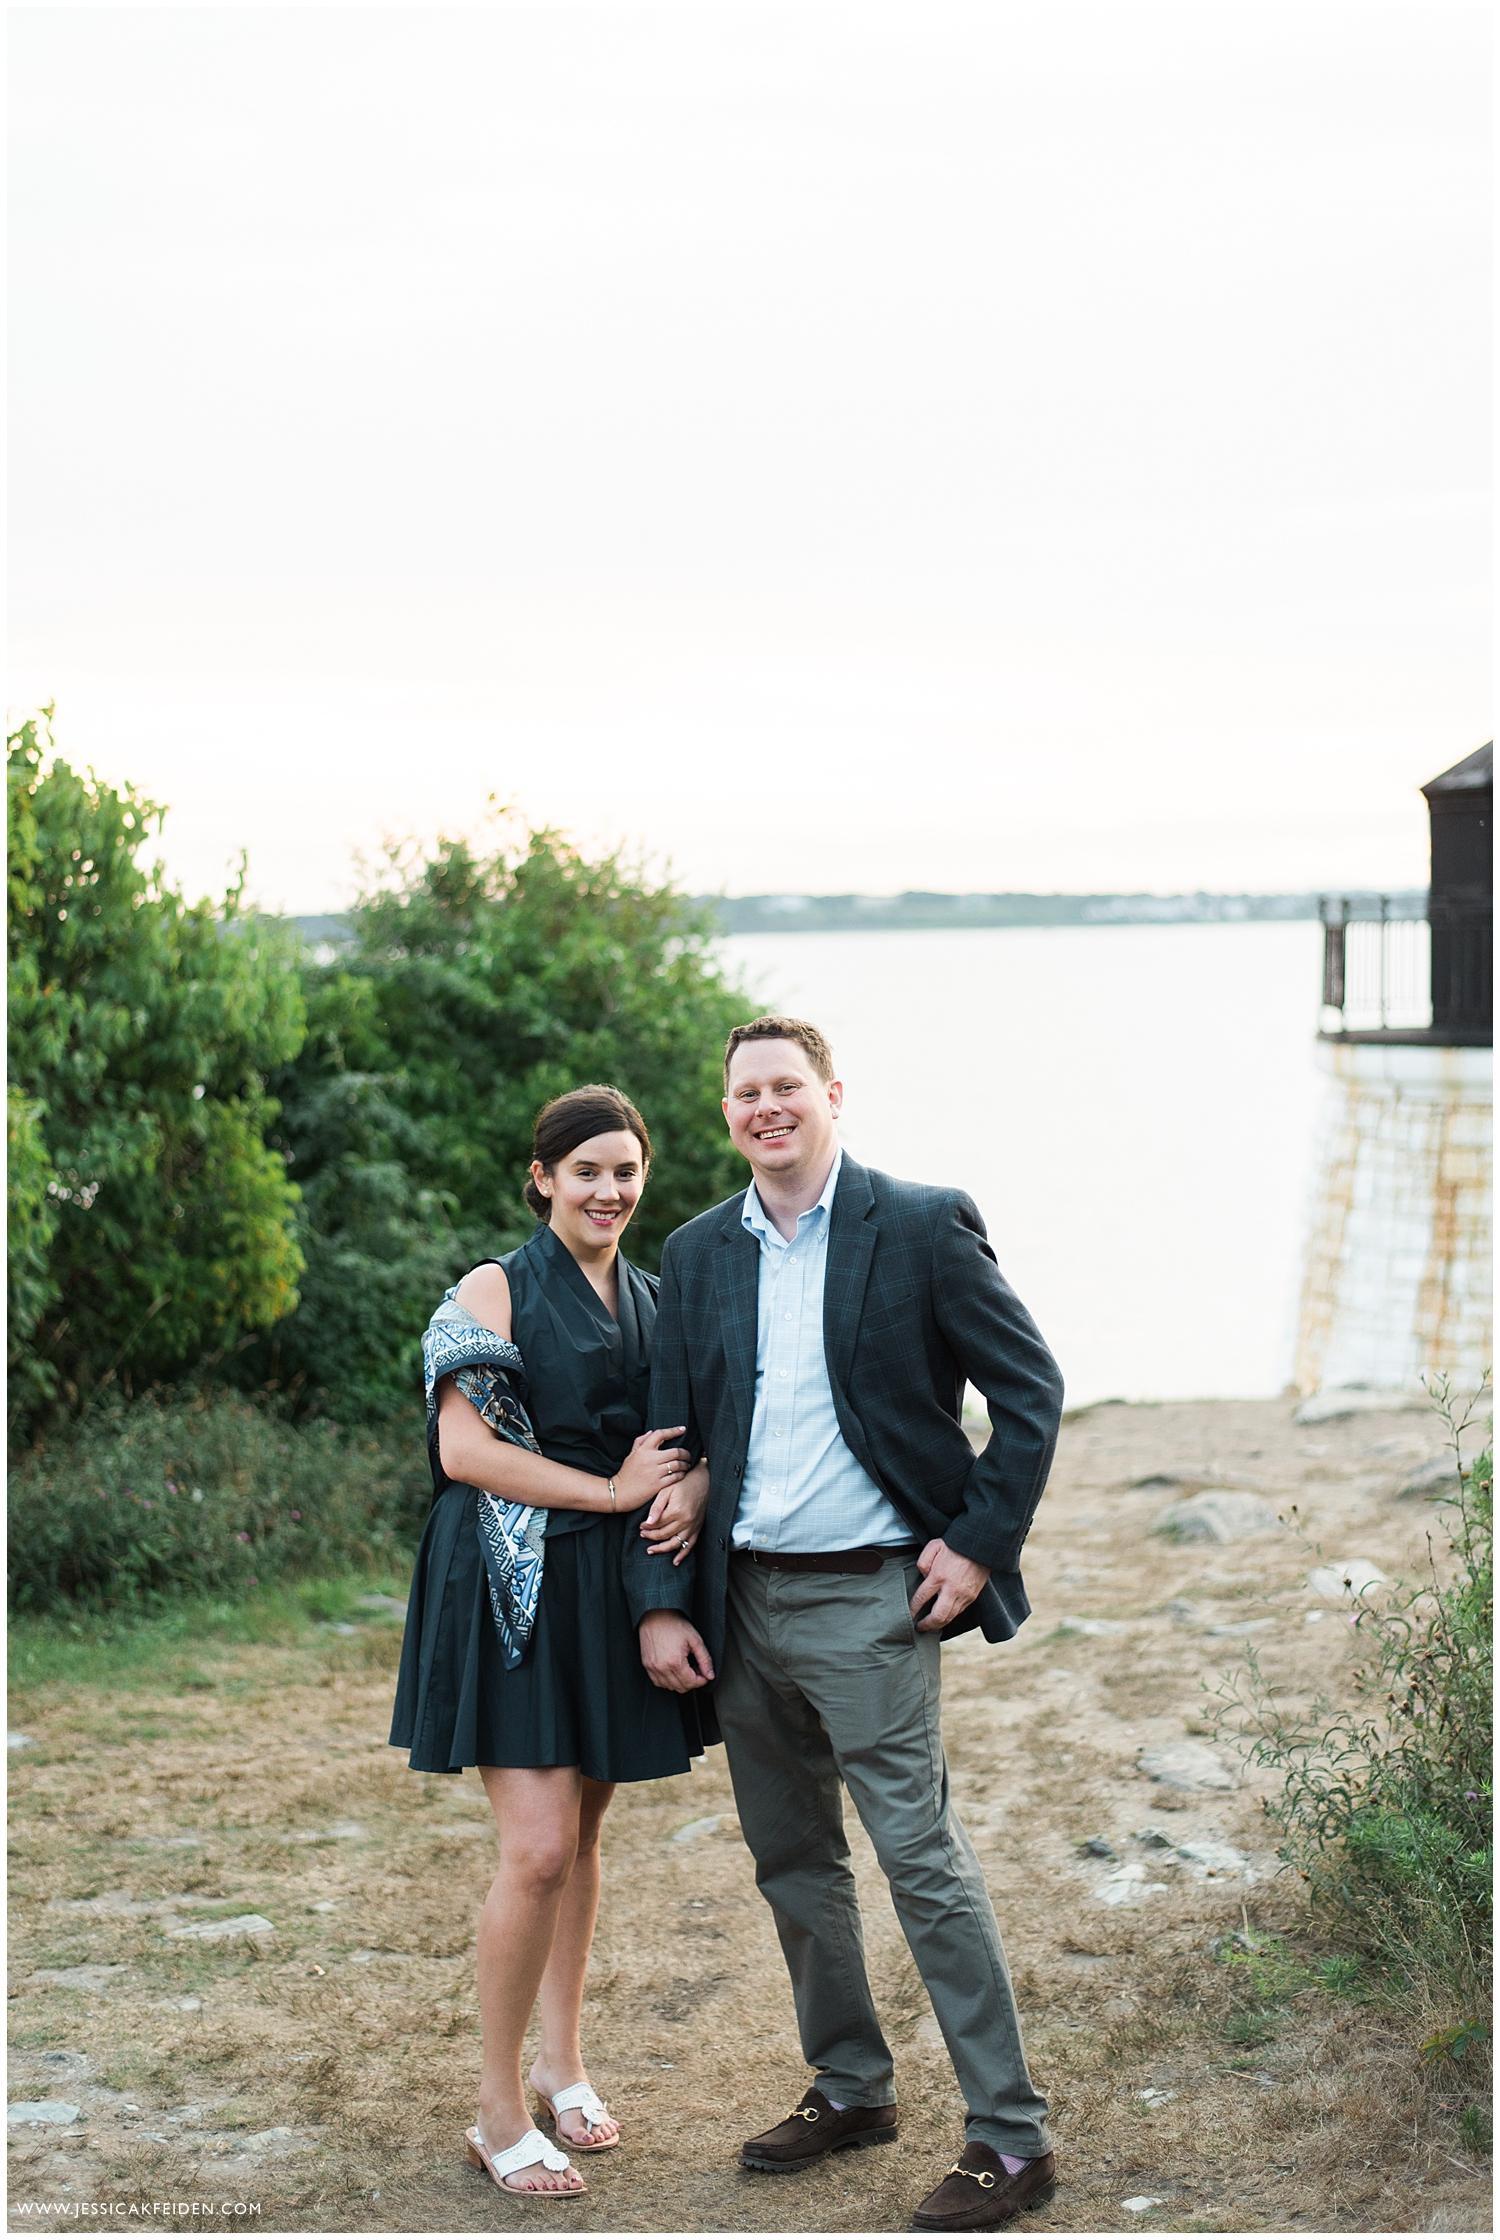 Jessica K Feiden Photography_Castle Hill Lighthouse Newport Engagement Session Photographer_0008.jpg